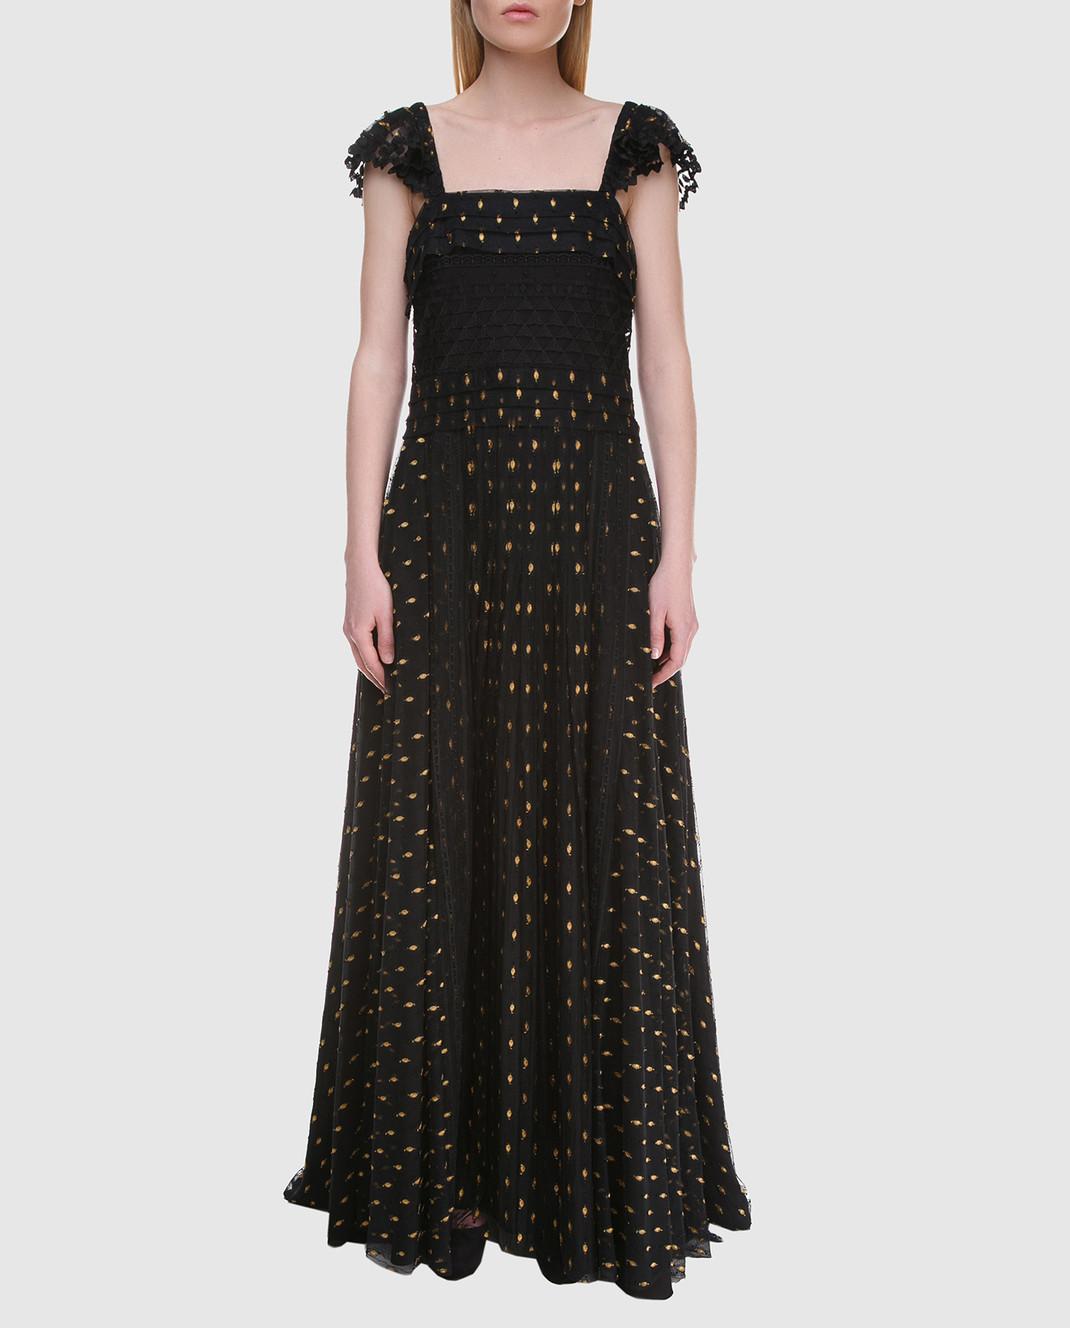 Philosophy di Lorenzo Serafini Вечернее платье A0417 изображение 3